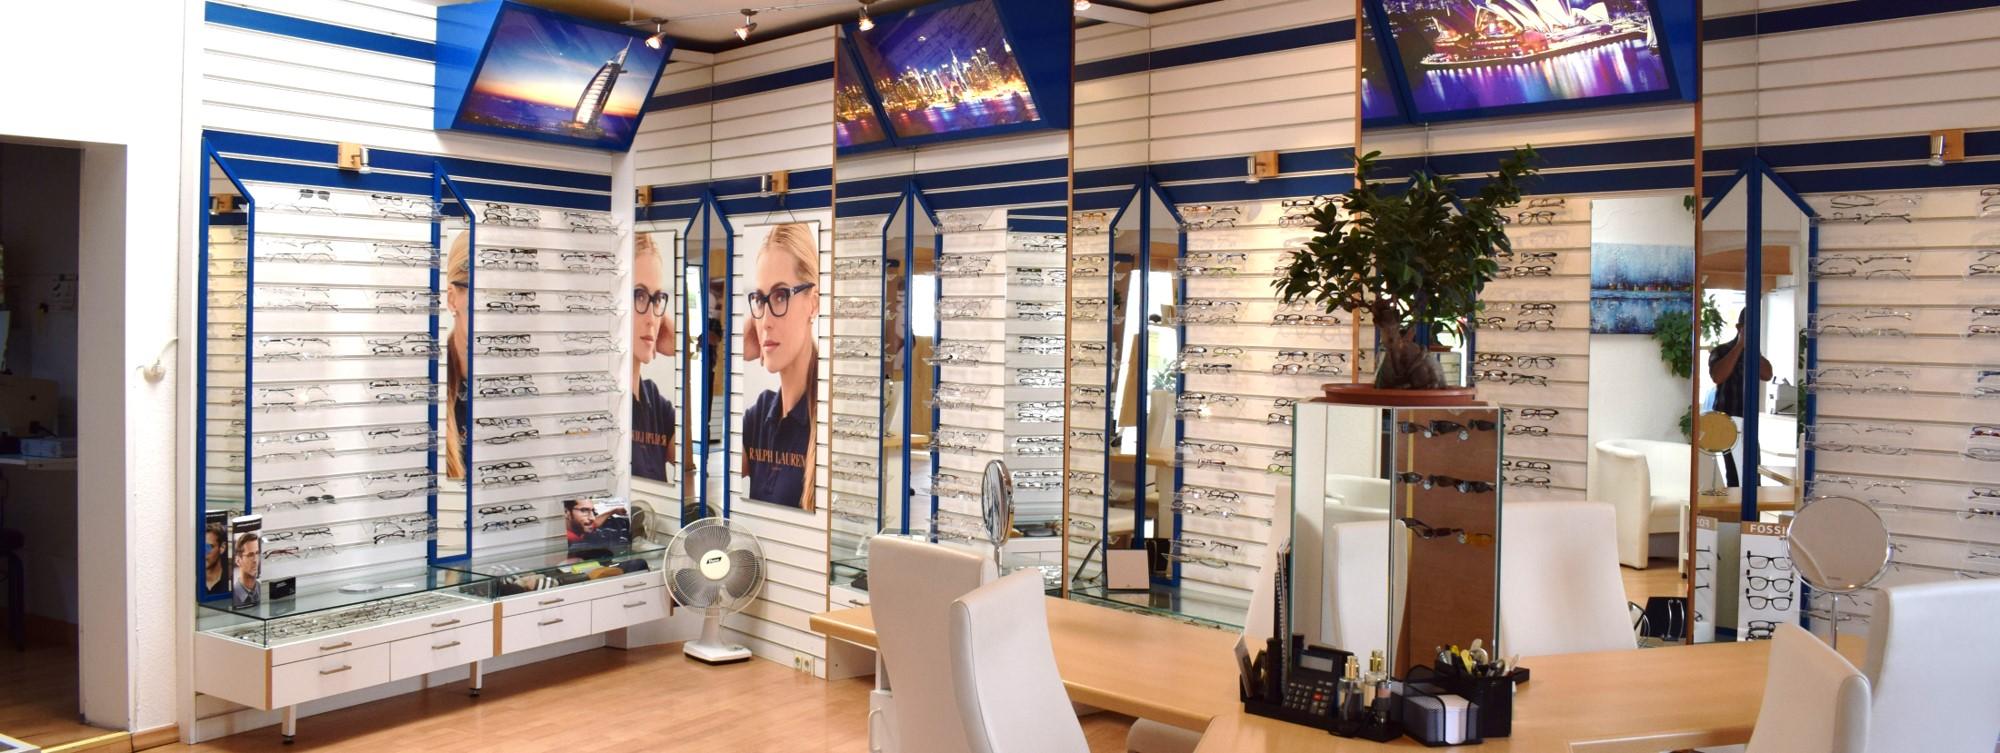 Augentrend Optik Verkaufsraum